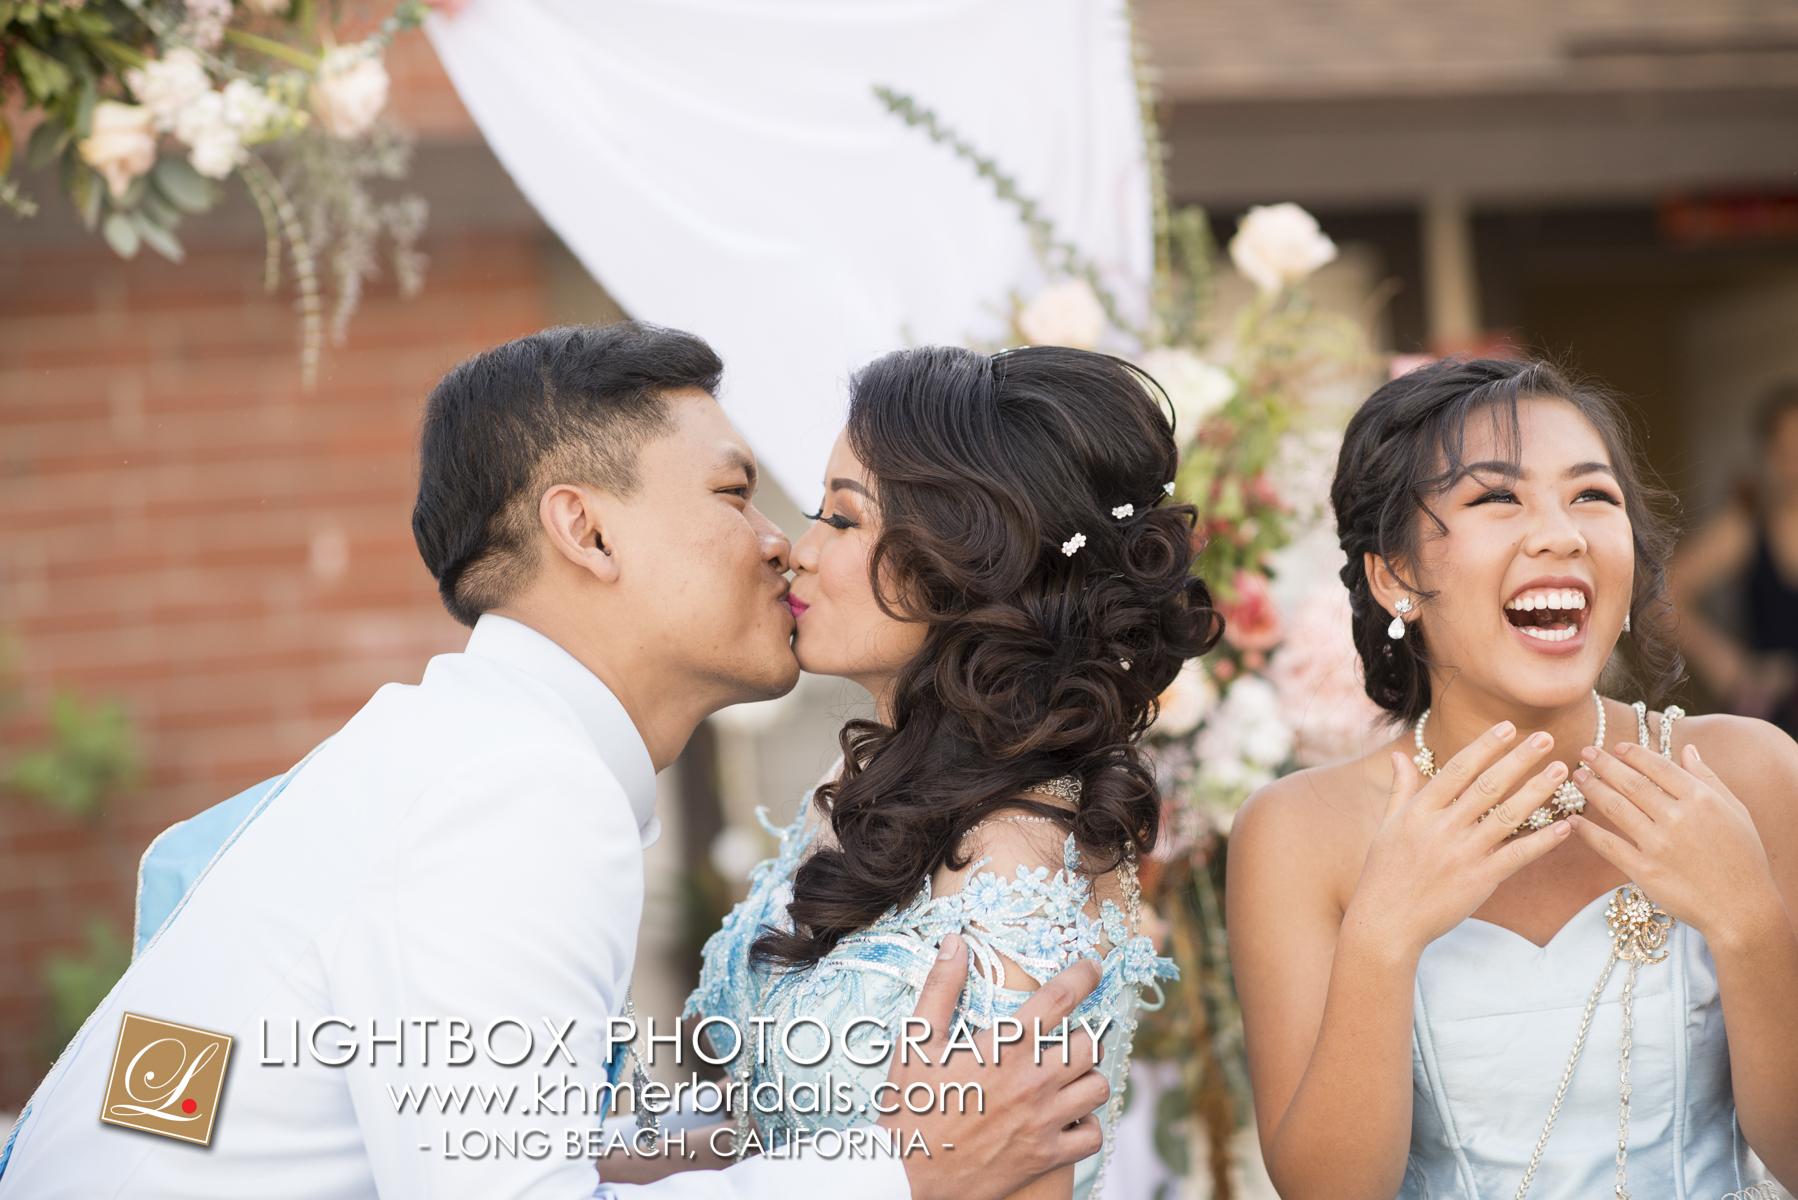 Khmer Bridal Wedding Photography video Apsara Studio Oufit-319.jpg